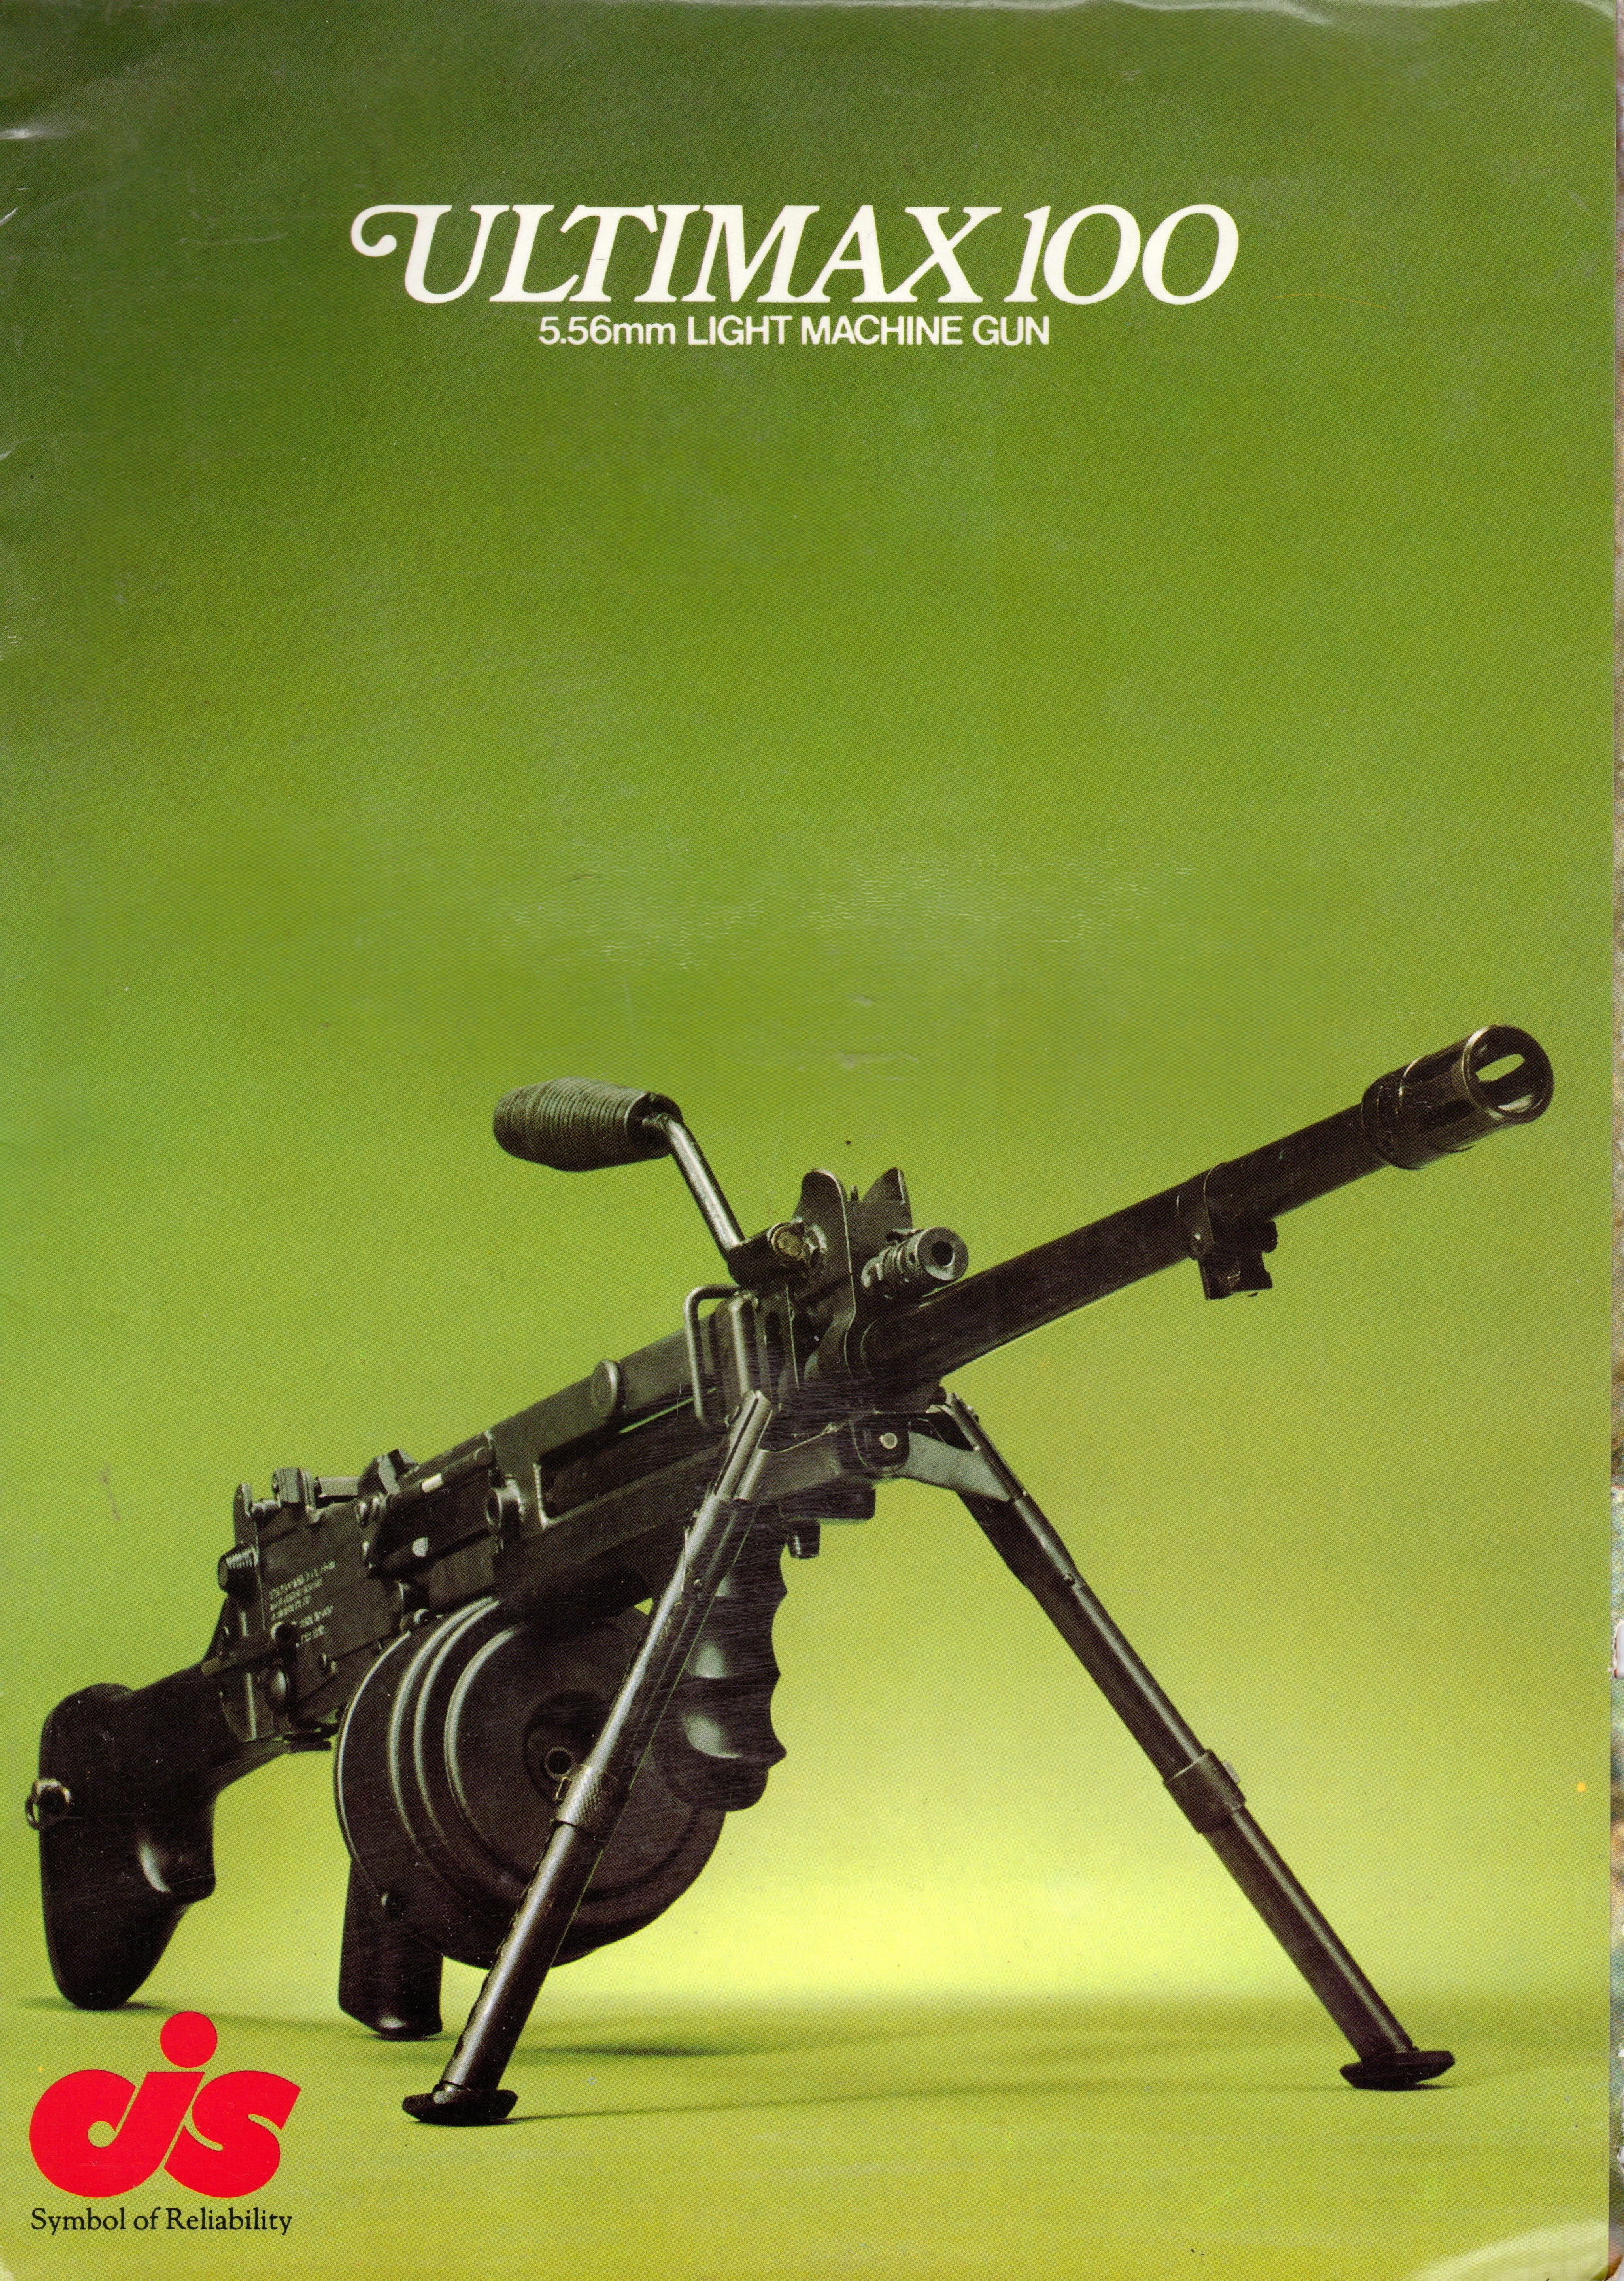 Ultimax 100 Light Machine Gun – The Armourers Bench